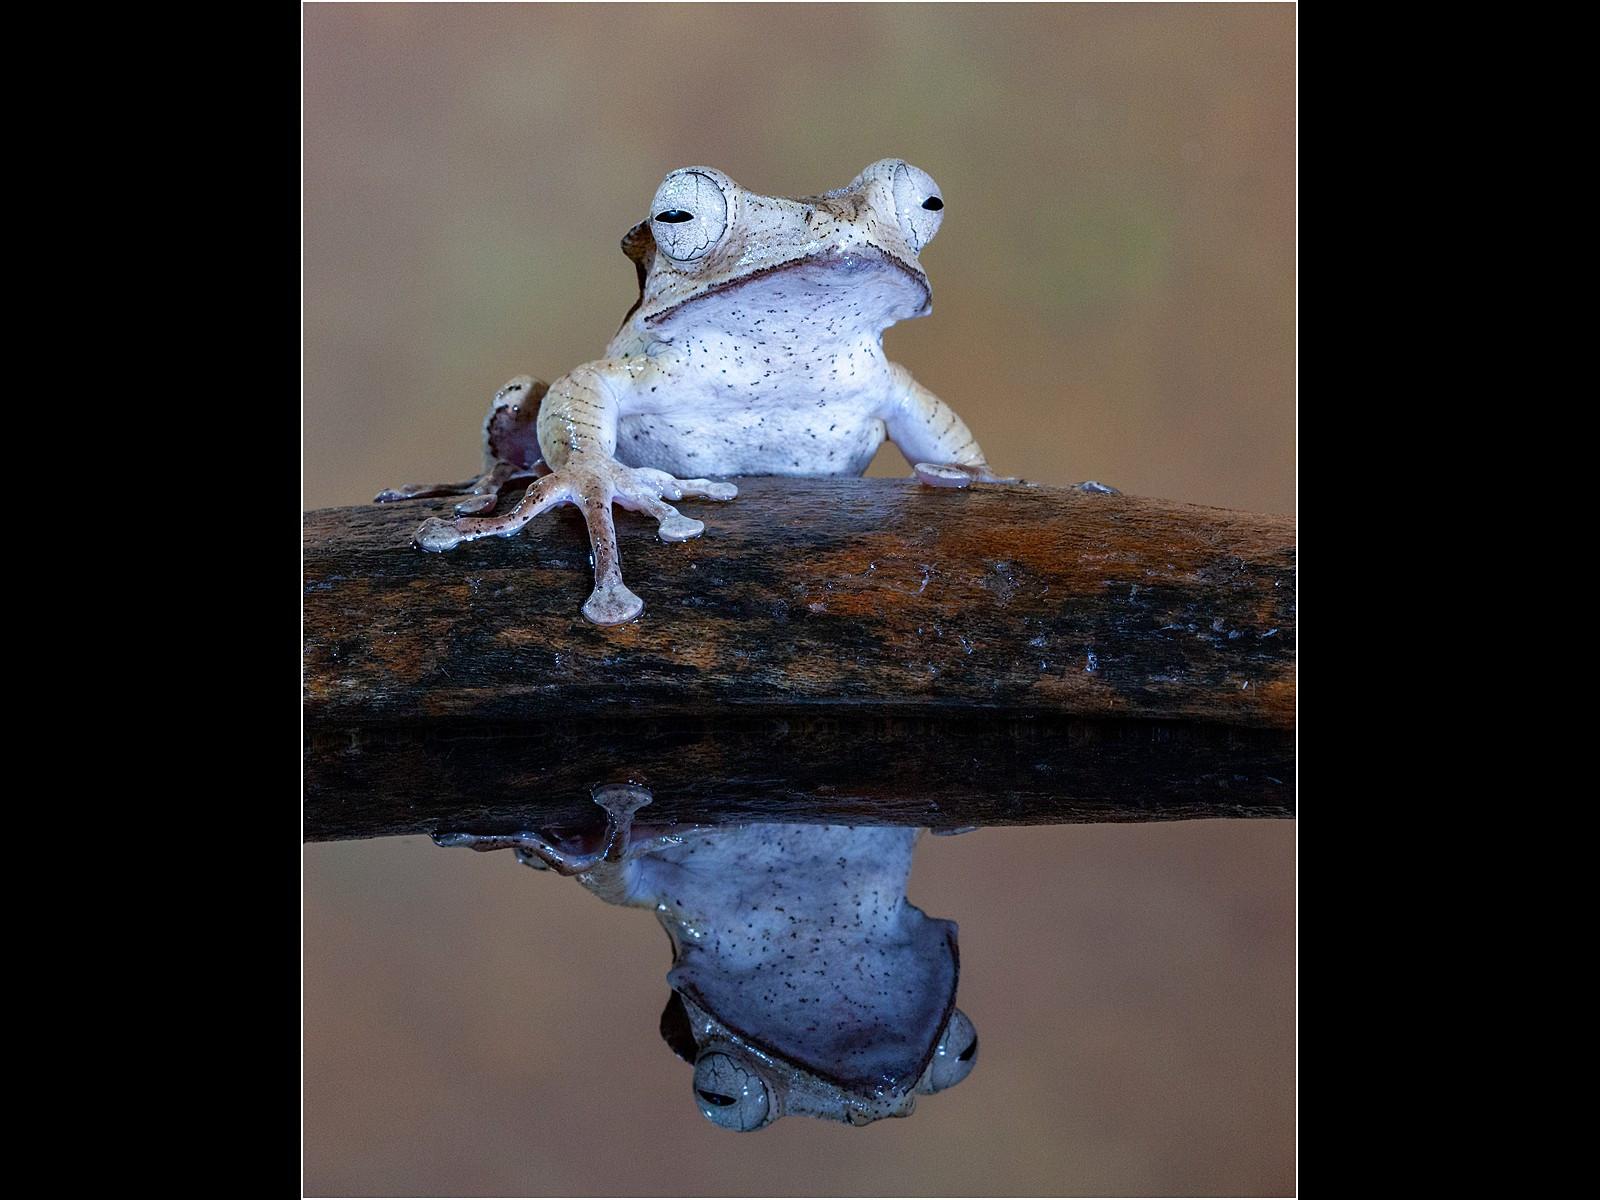 Golden Tree Frog & Reflection